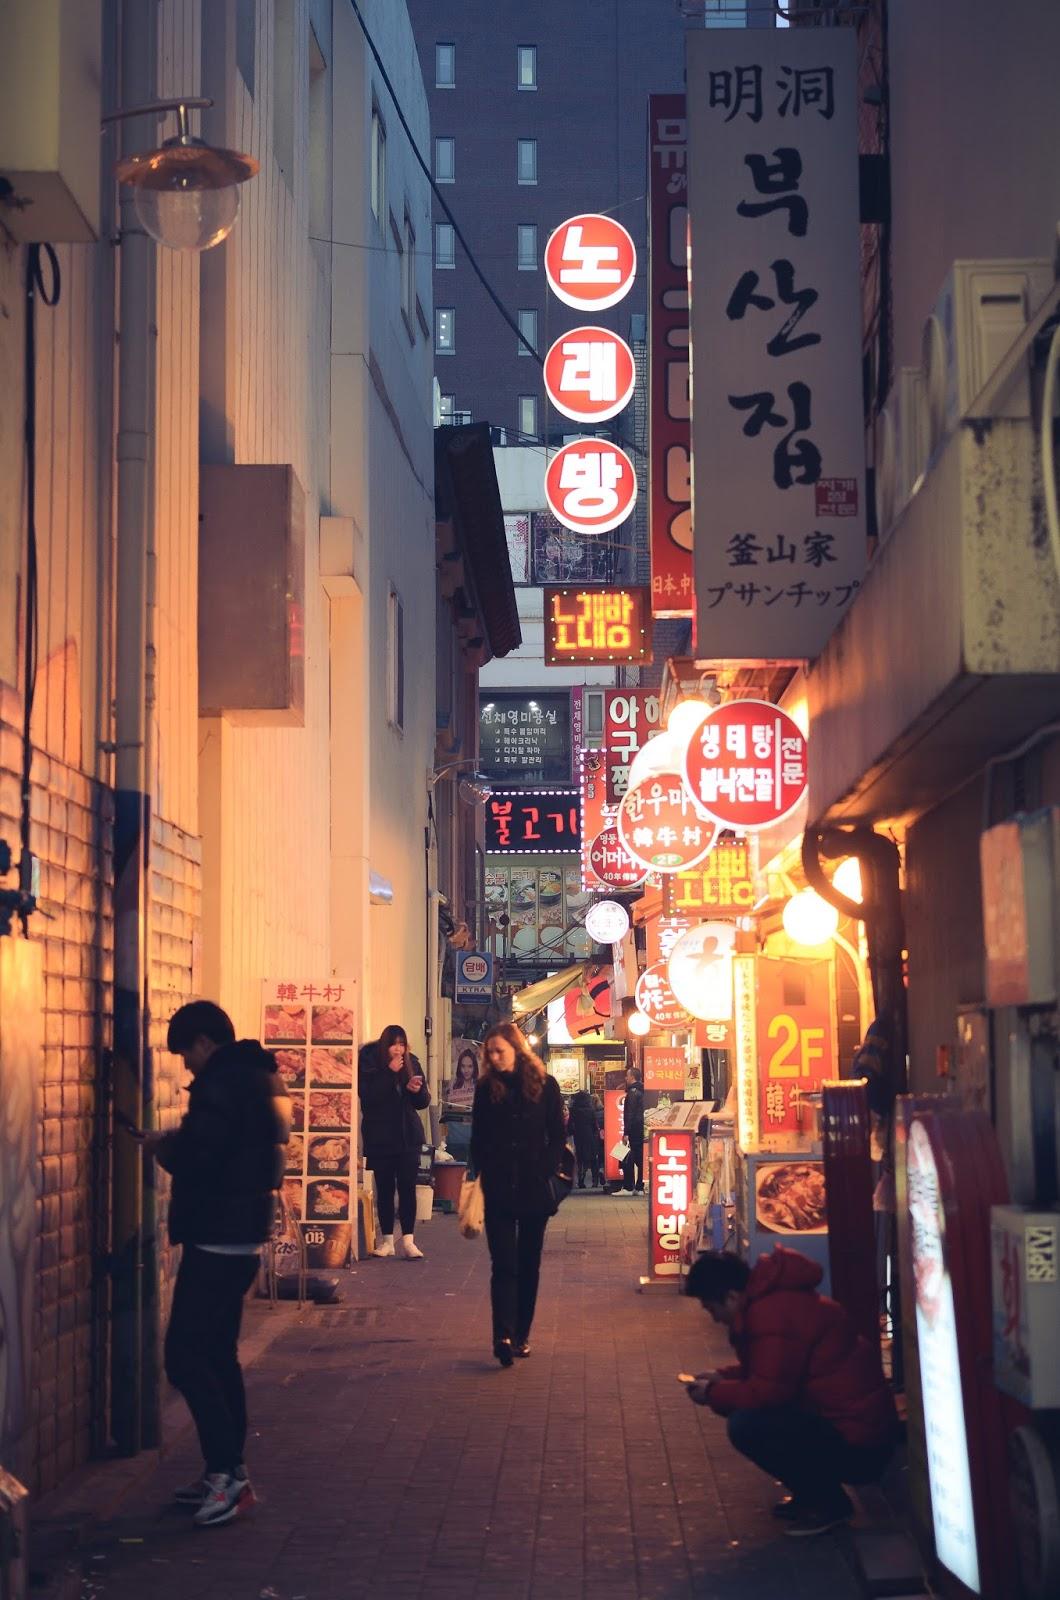 Seoul Travel Nico Vermeulen